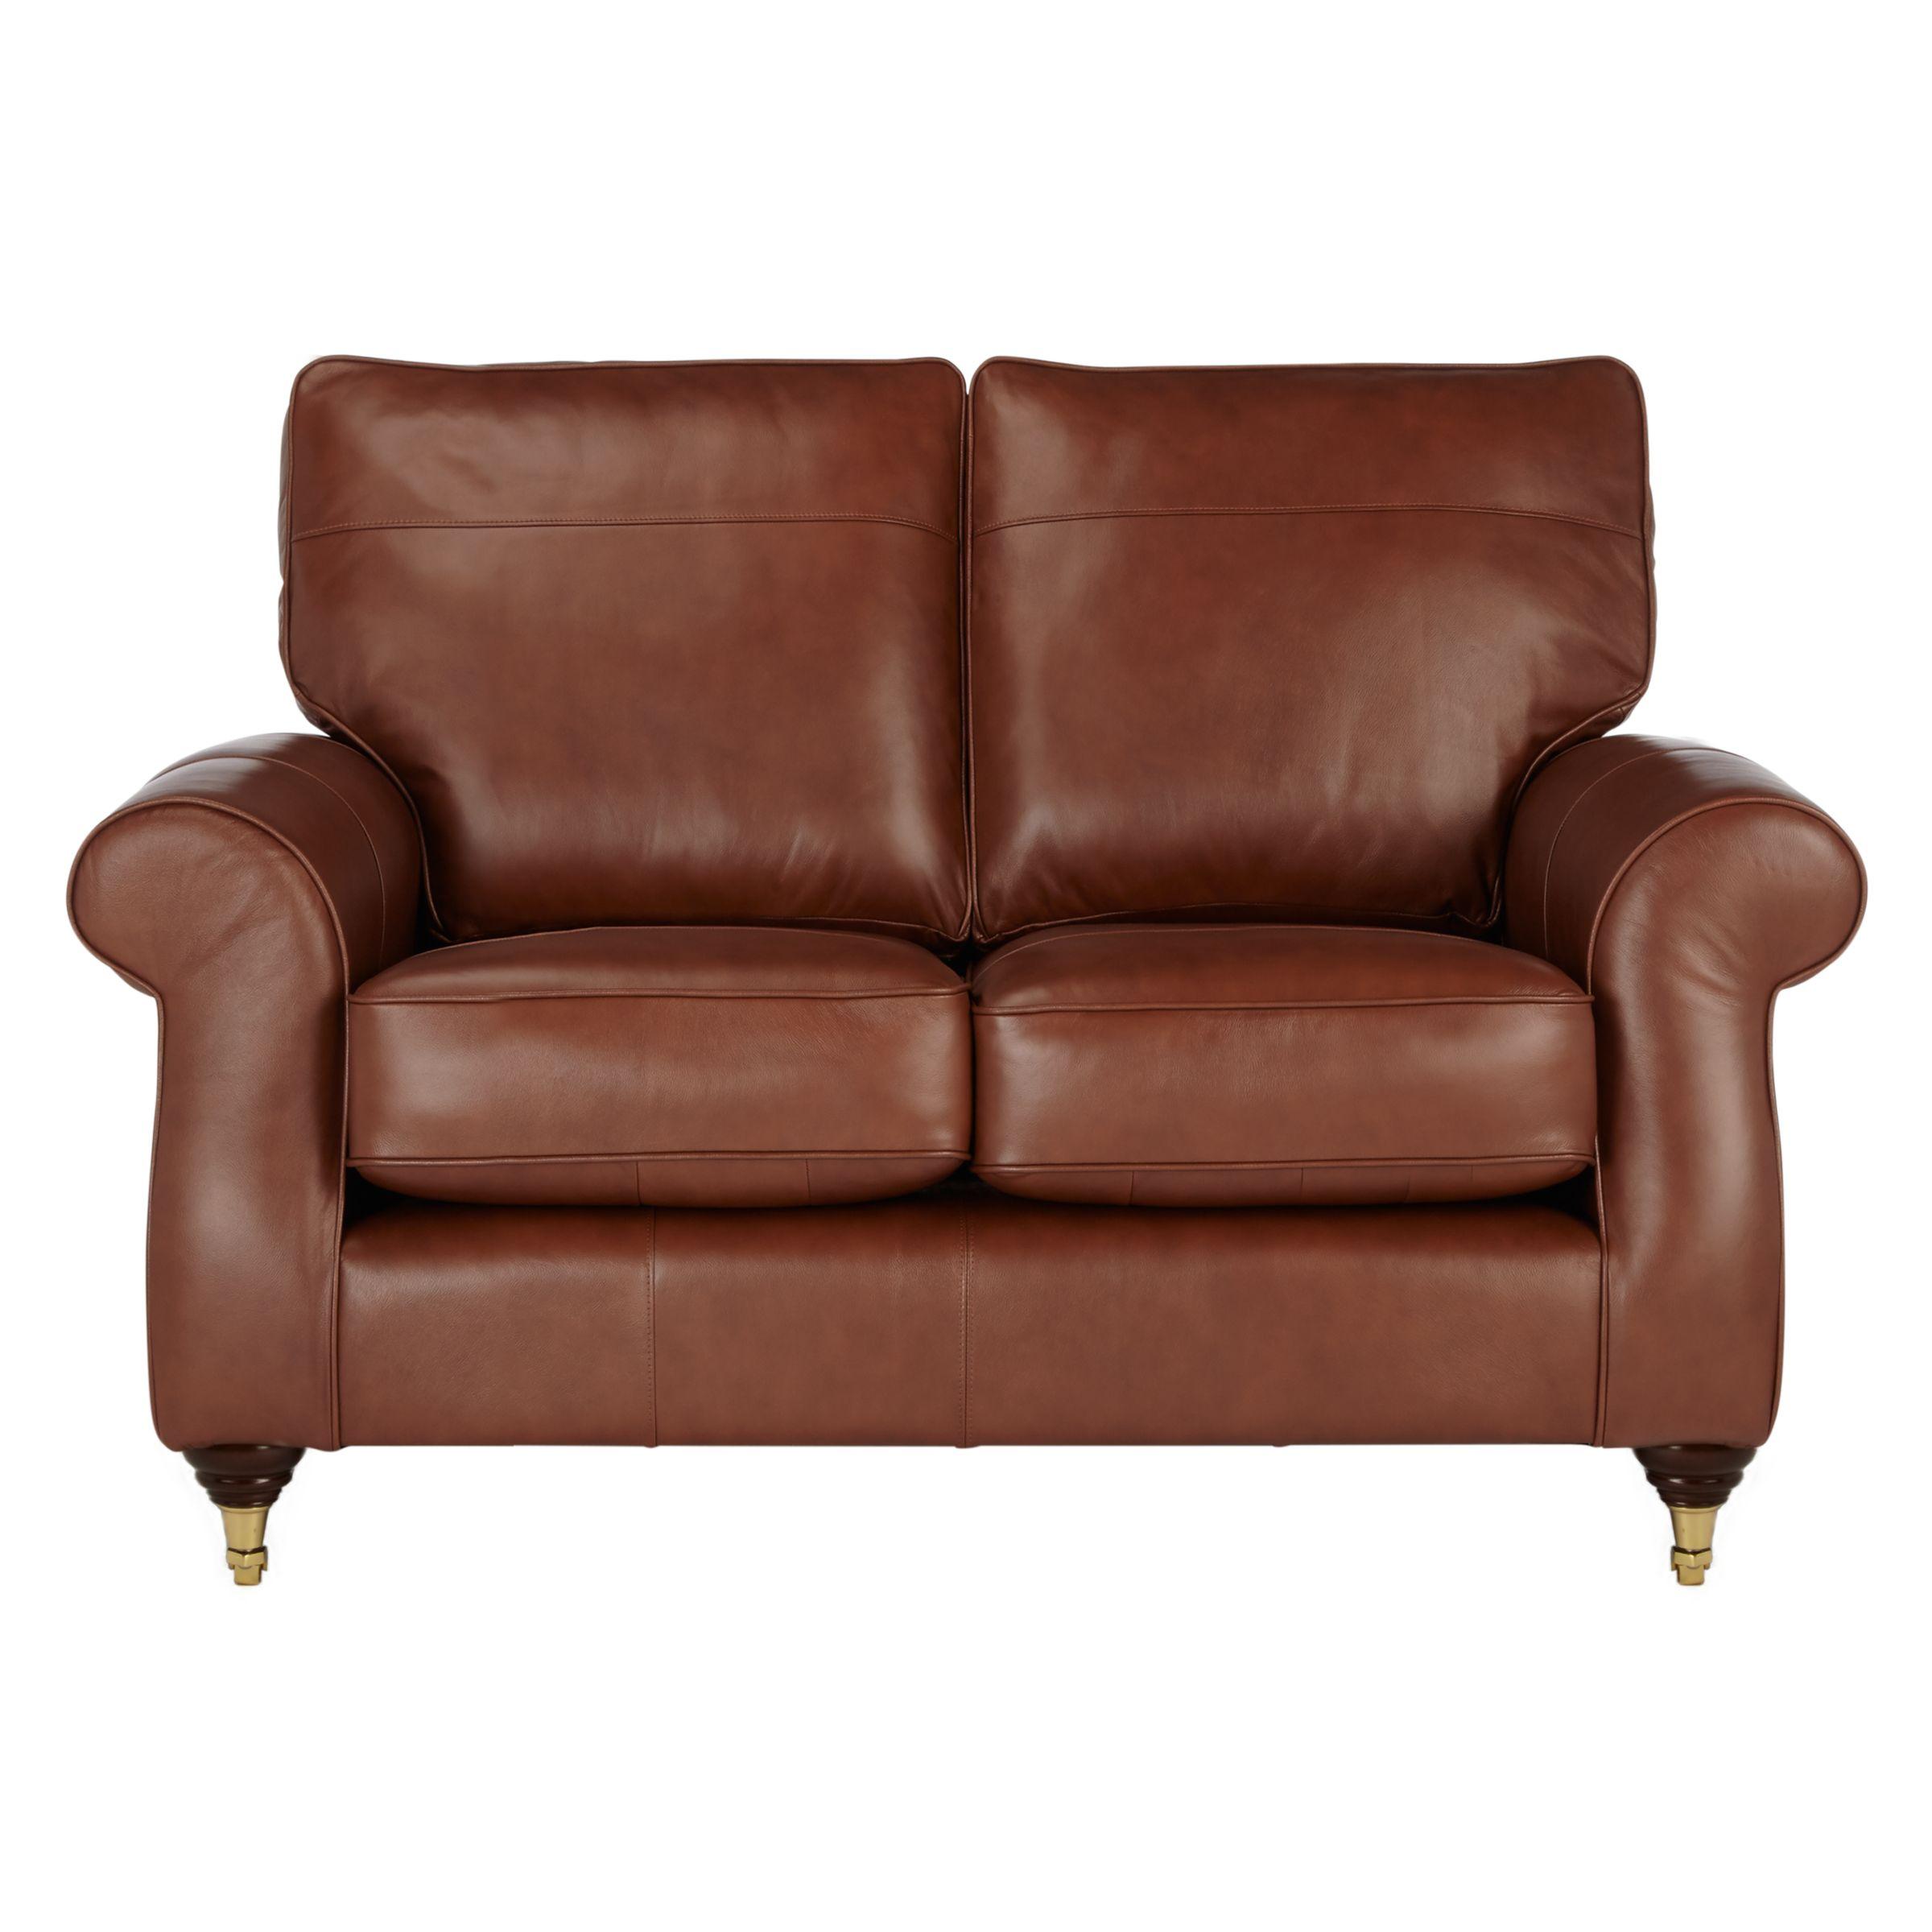 - John Lewis Hannah Small 2 Seater Leather Sofa, Castor Leg At John